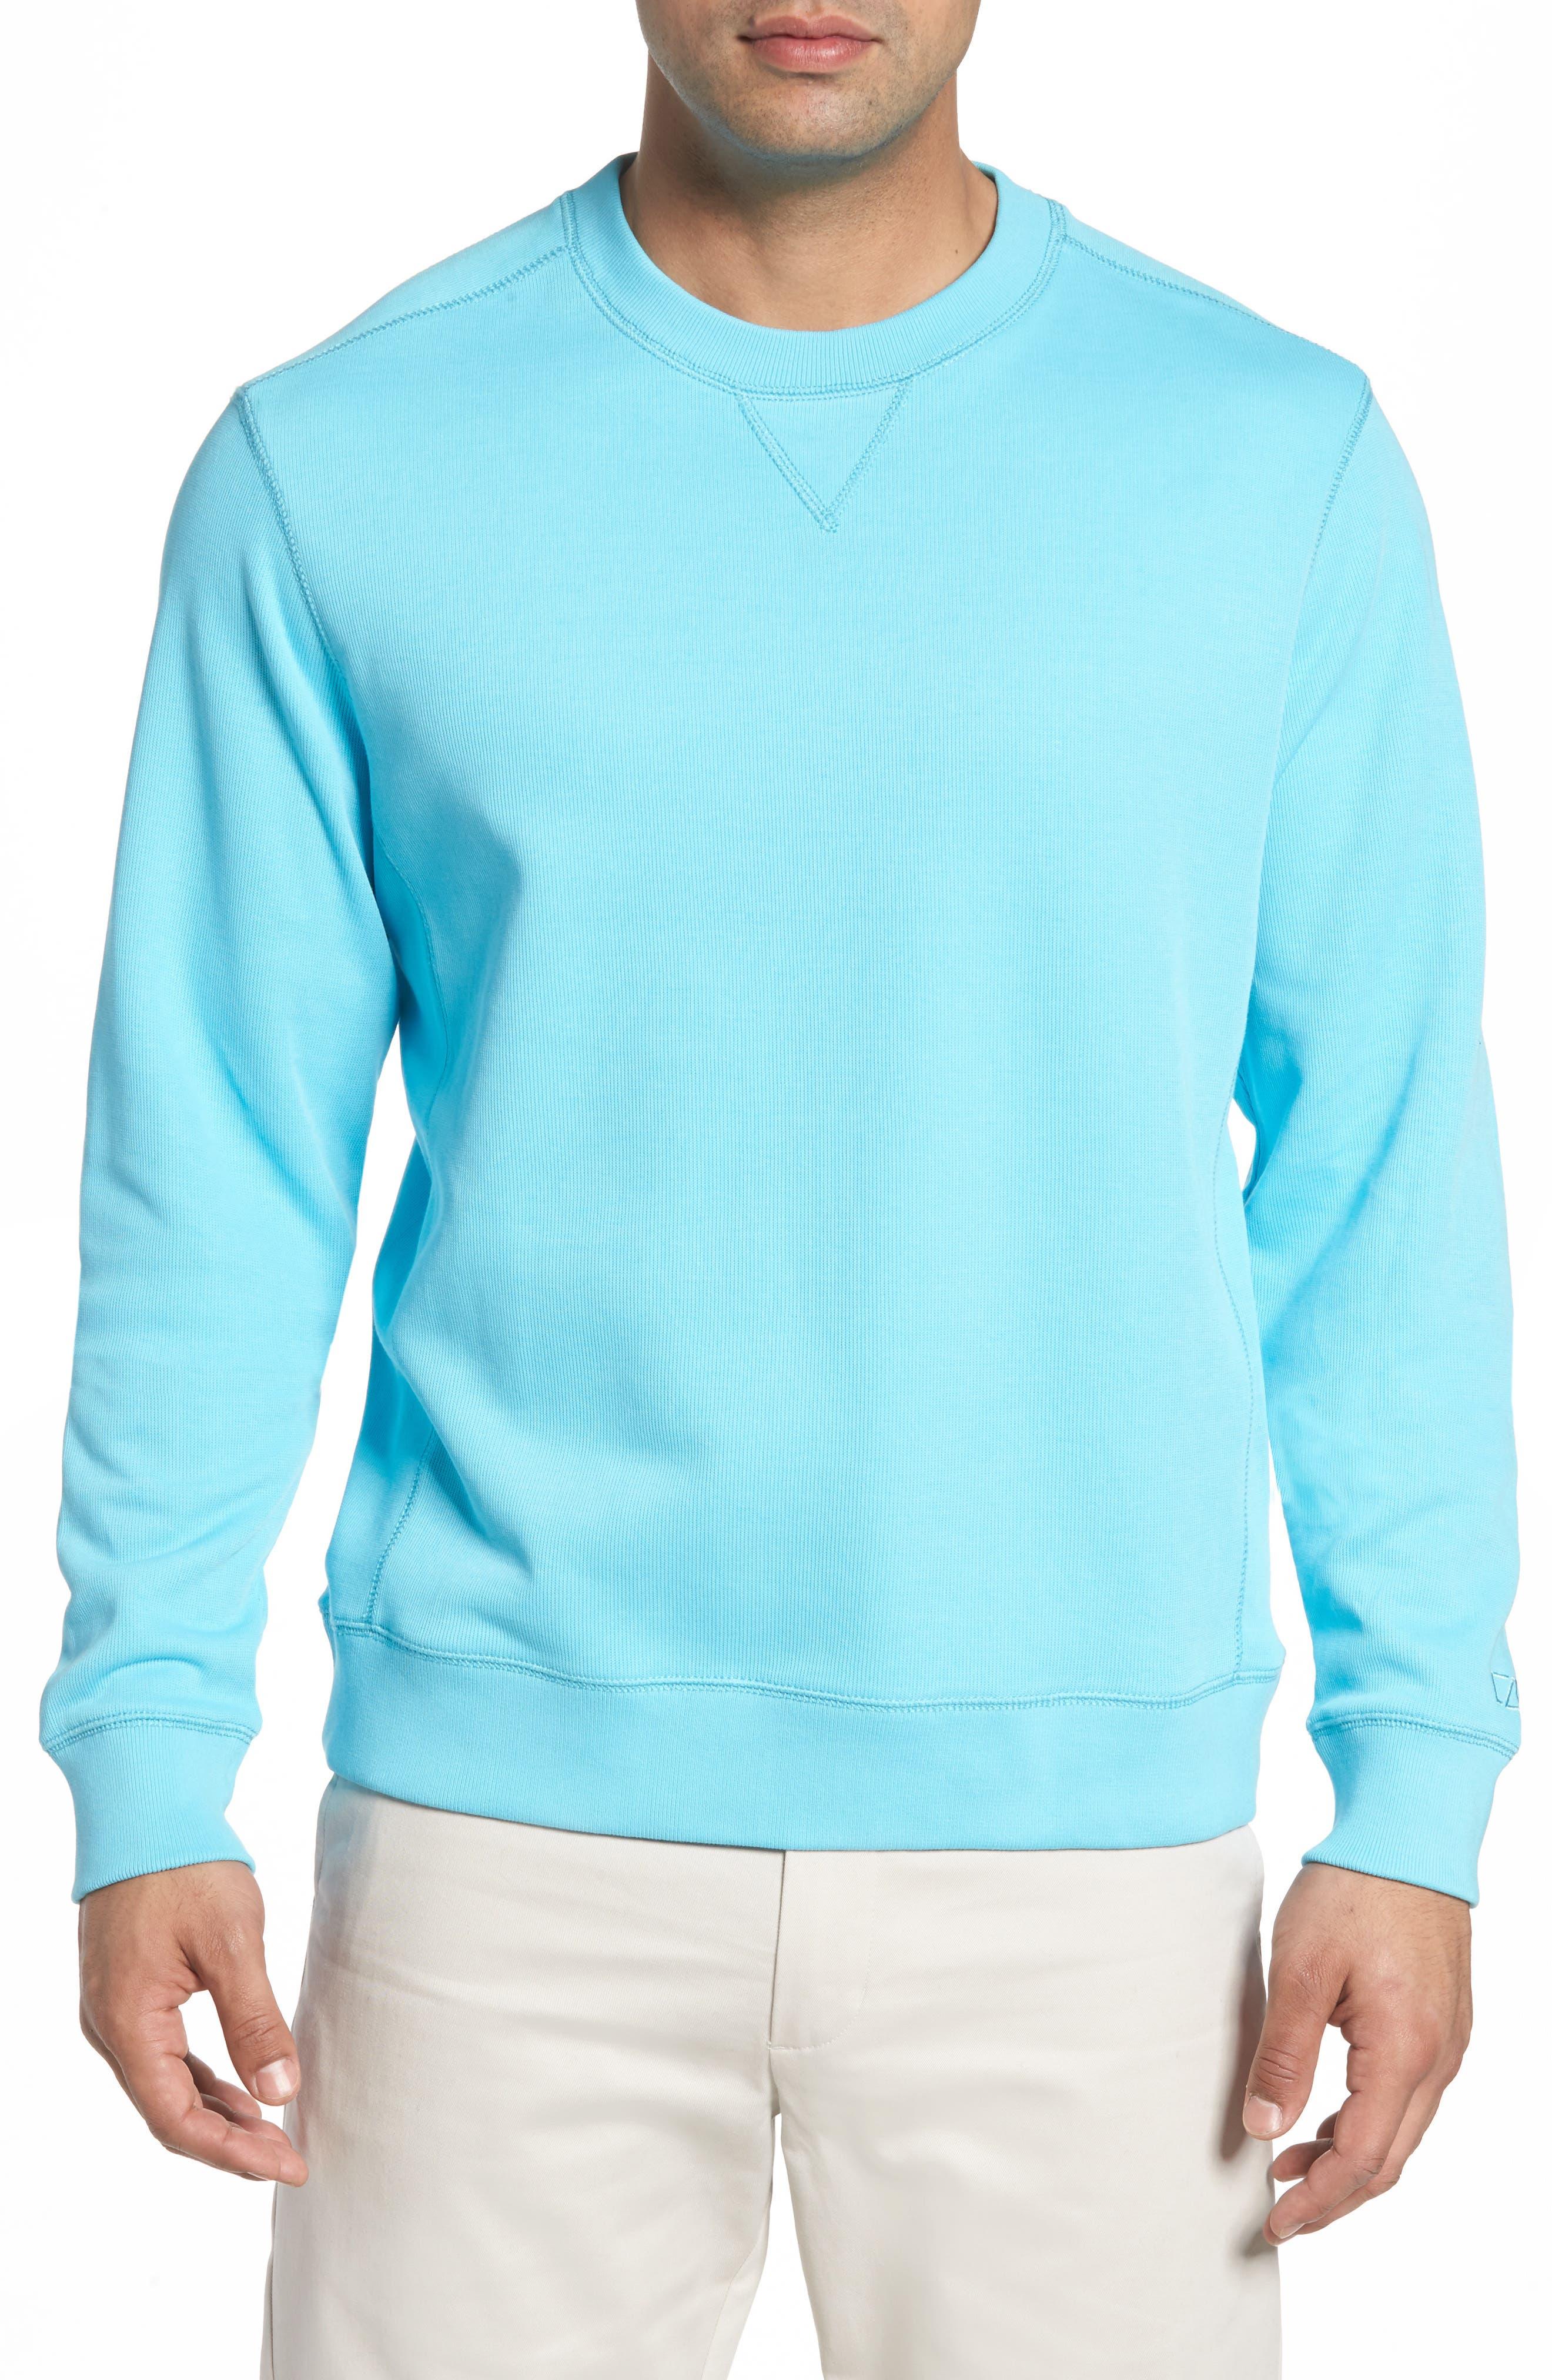 Main Image - Cutter & Buck Bayview Crewneck Sweatshirt